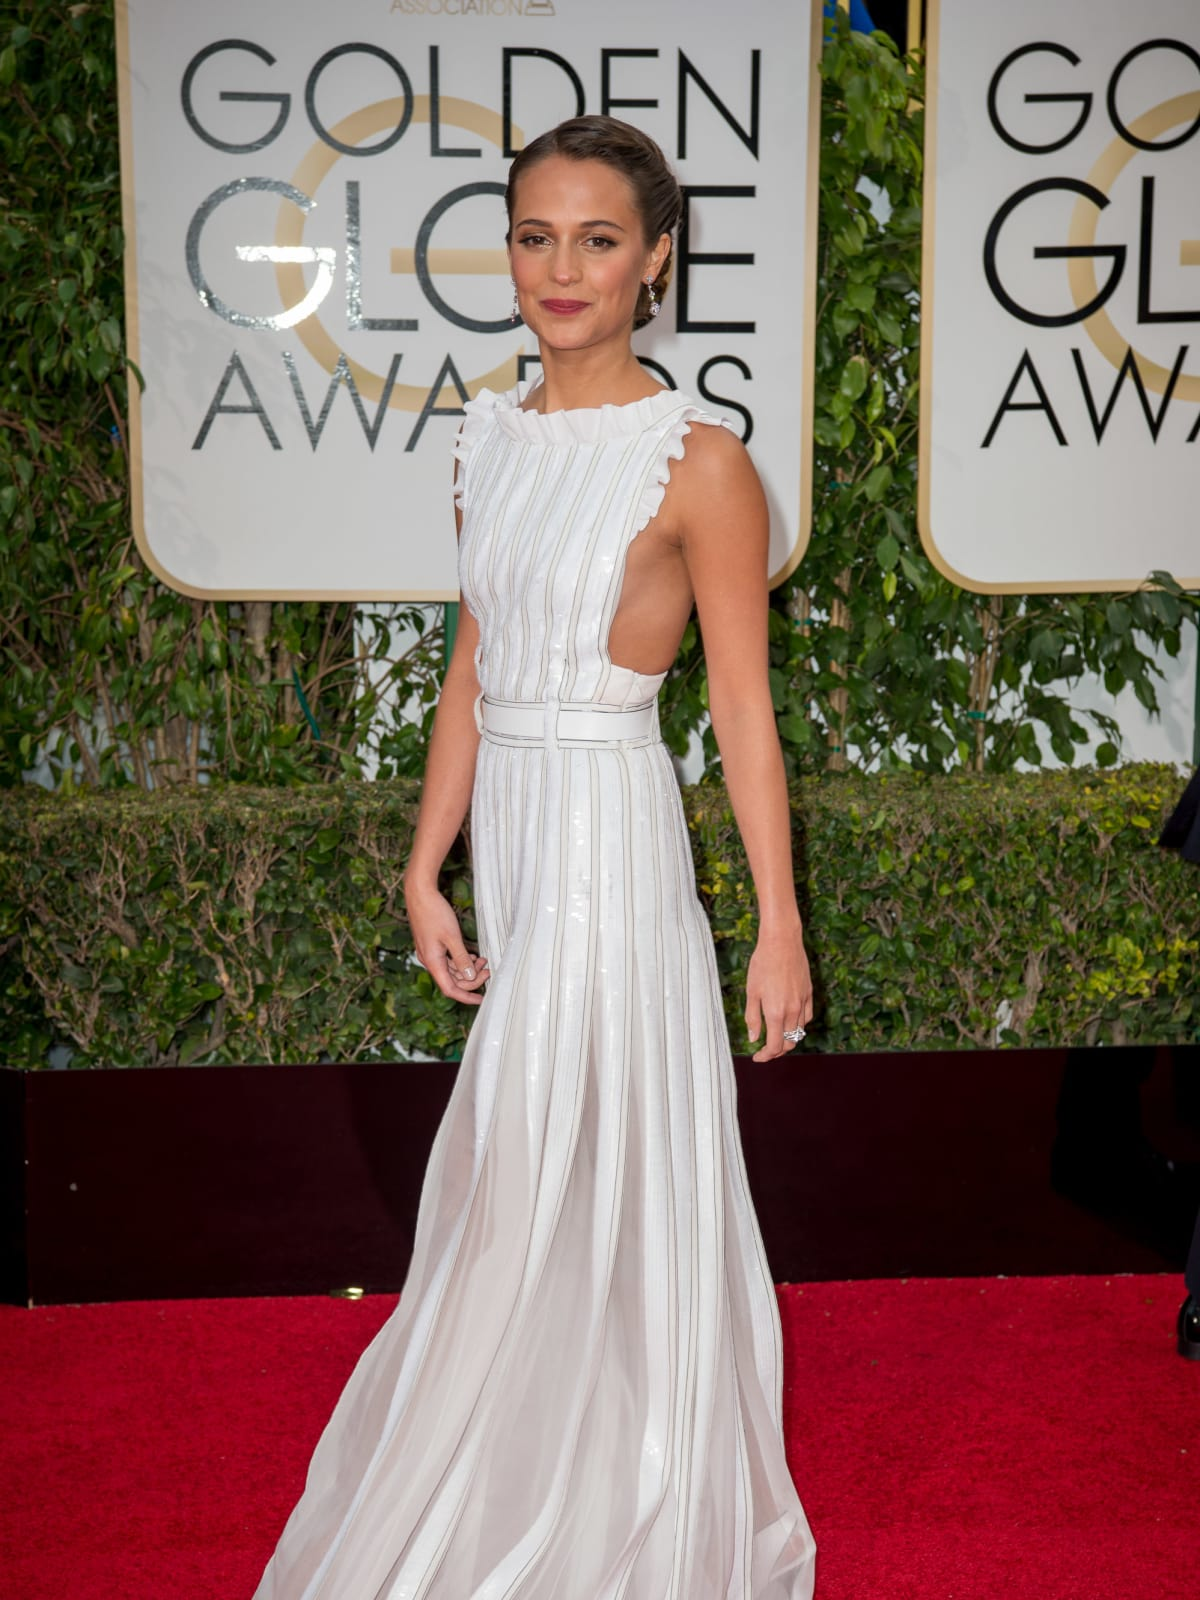 Alicia Vikander at Golden Globe Awards